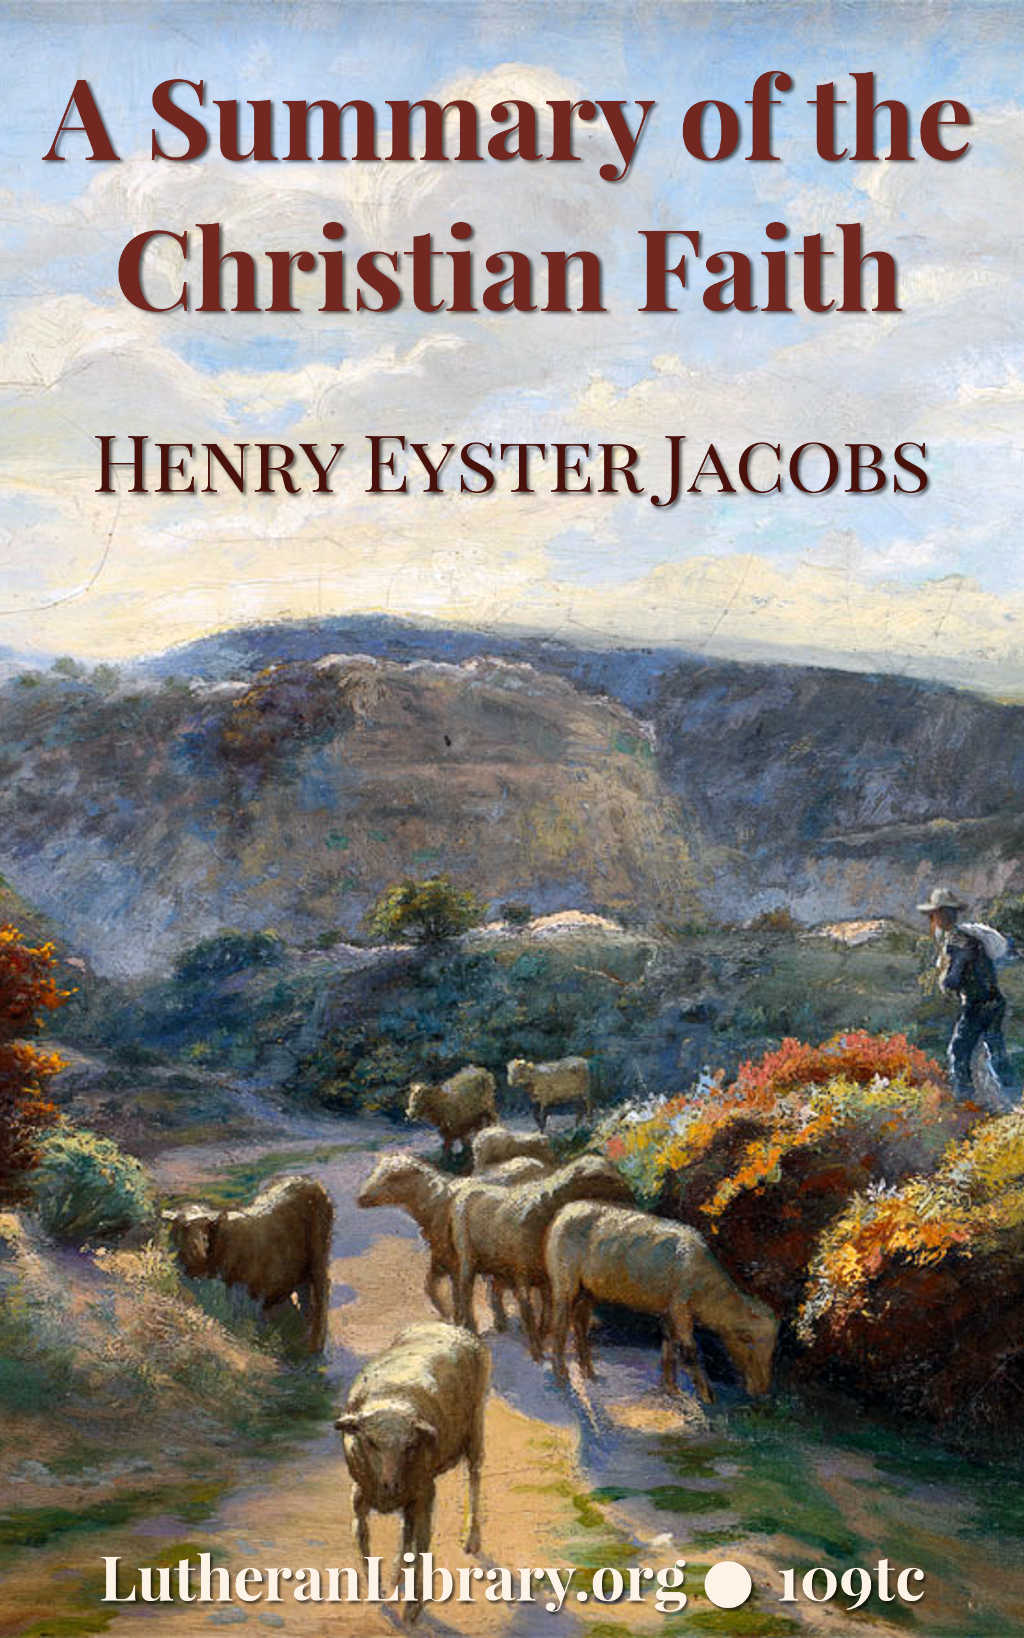 A Summary of the Christian Faith by Henry Eyster Jacobs